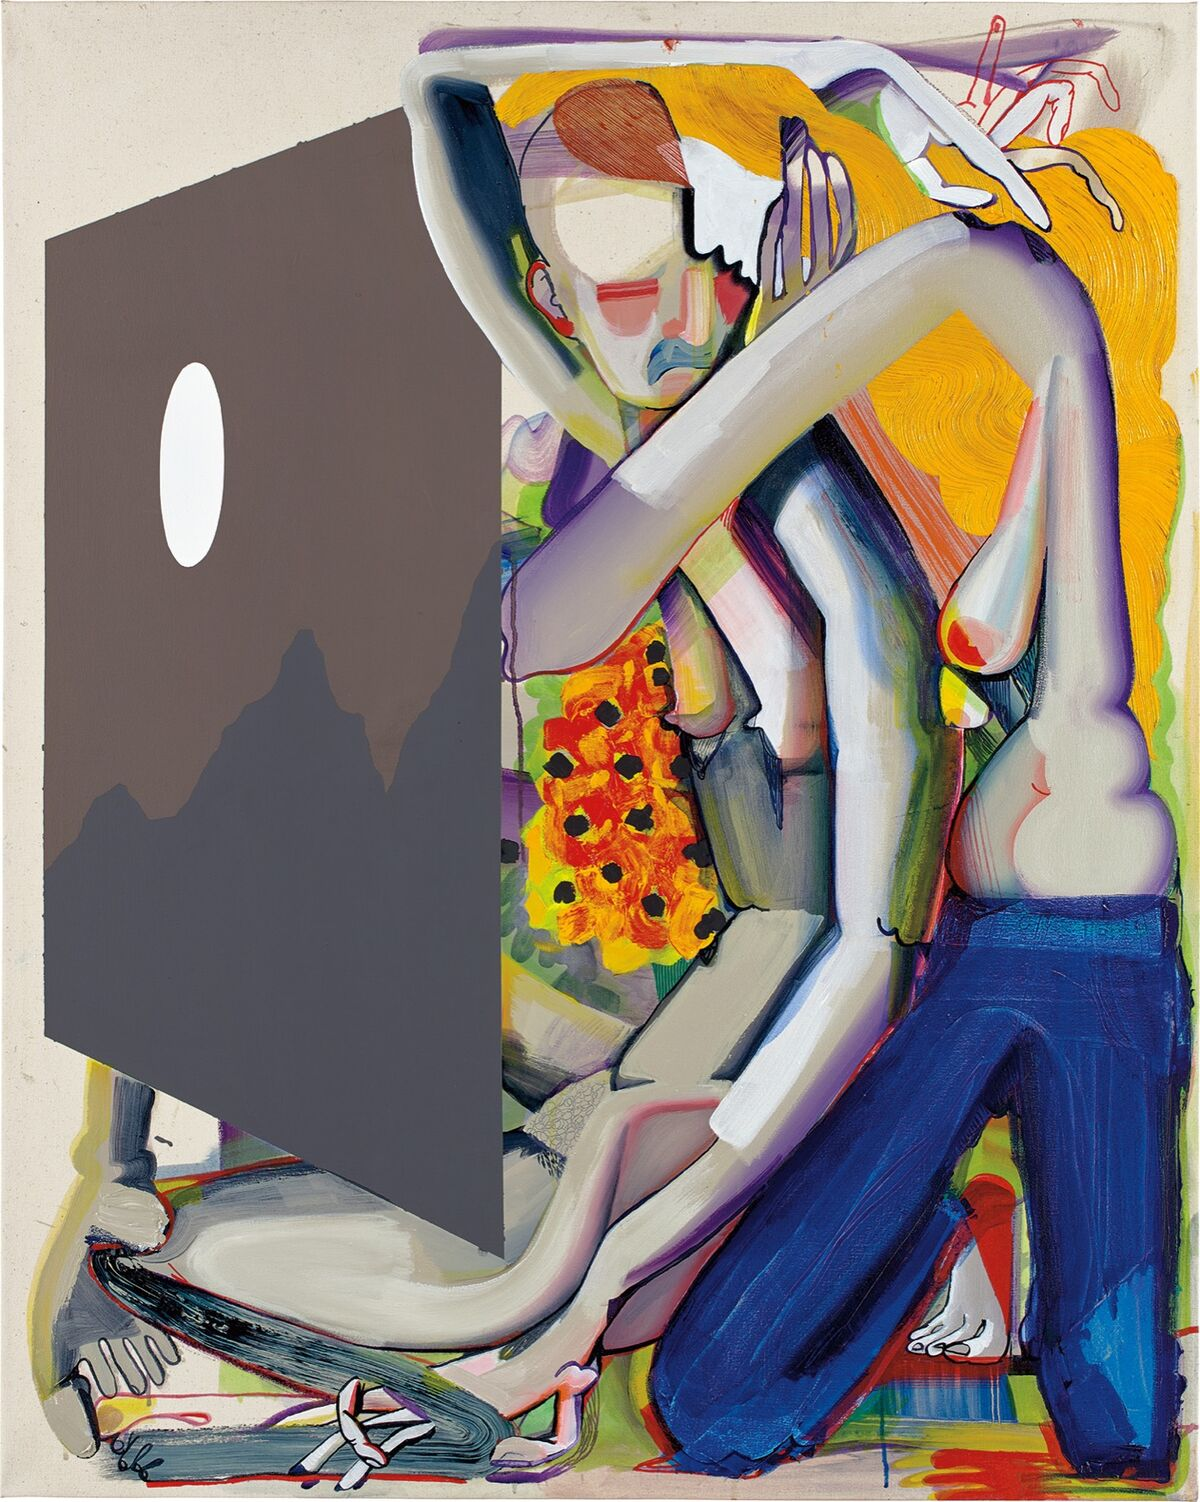 Christina Quarles, Moon (Lez Go Out N' Feel Tha Nite), 2017